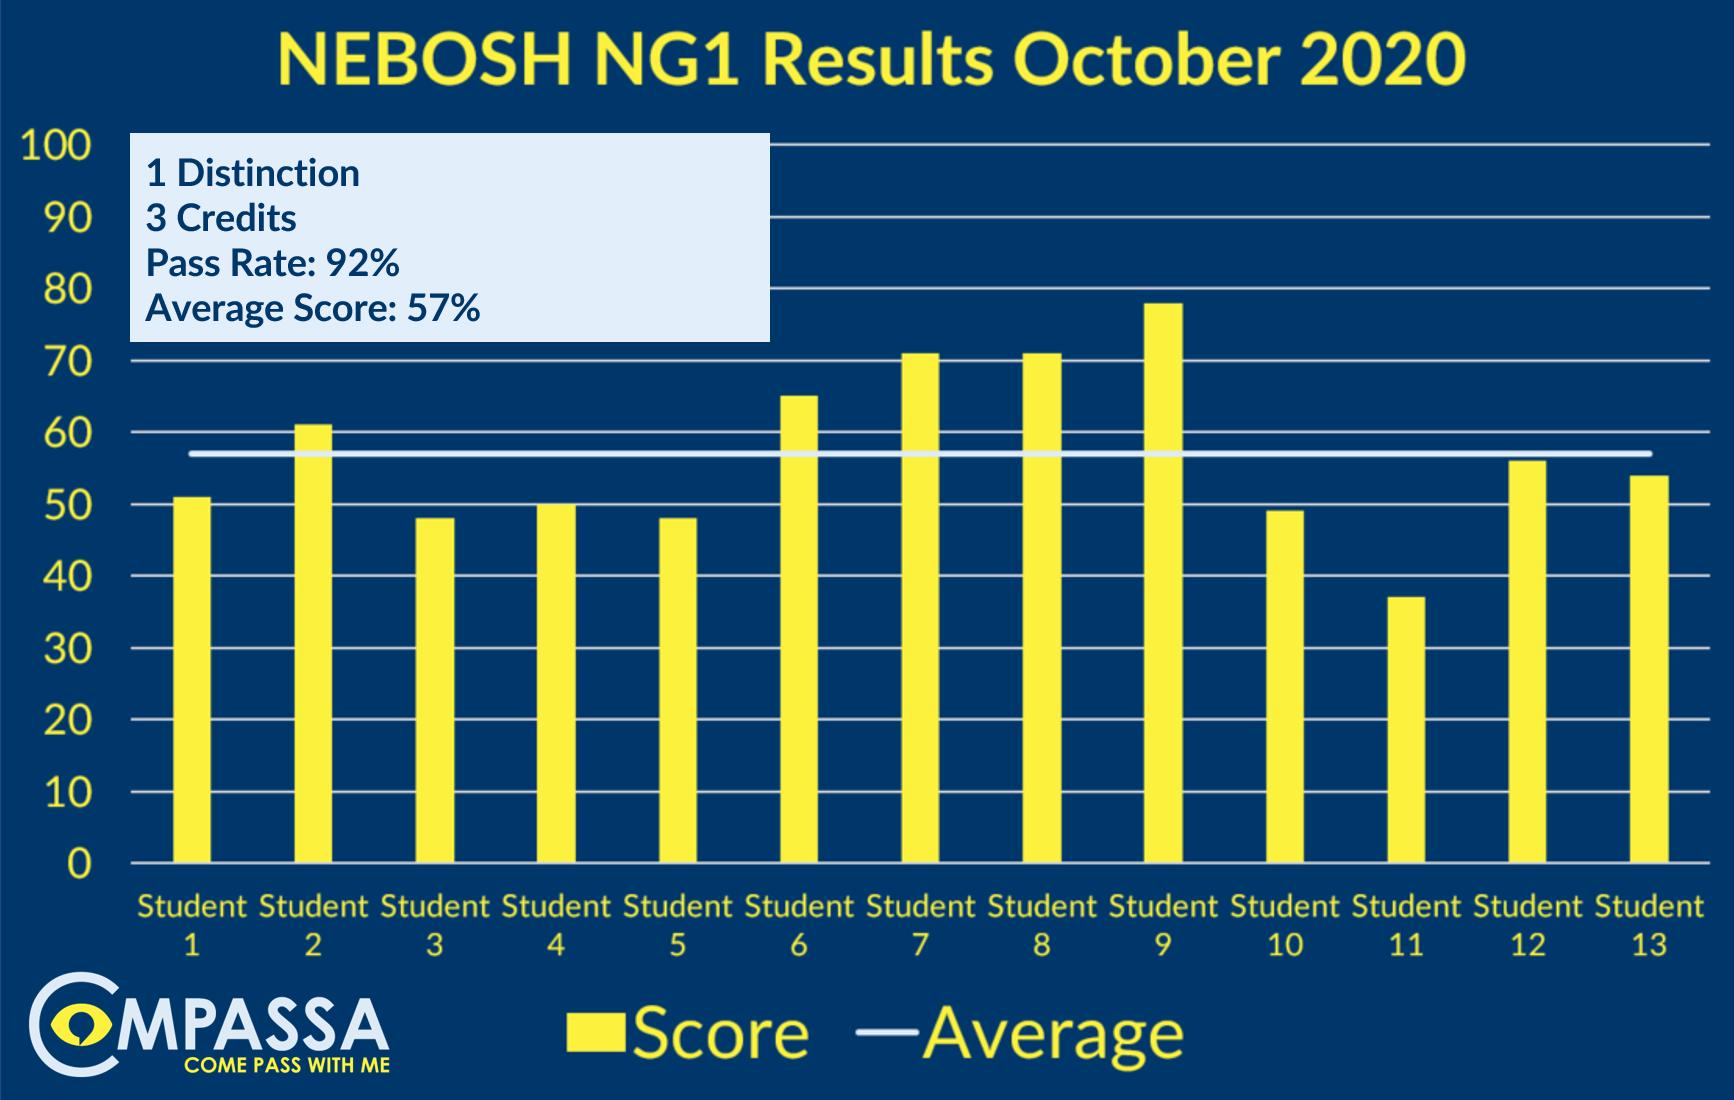 NEBOSH Results